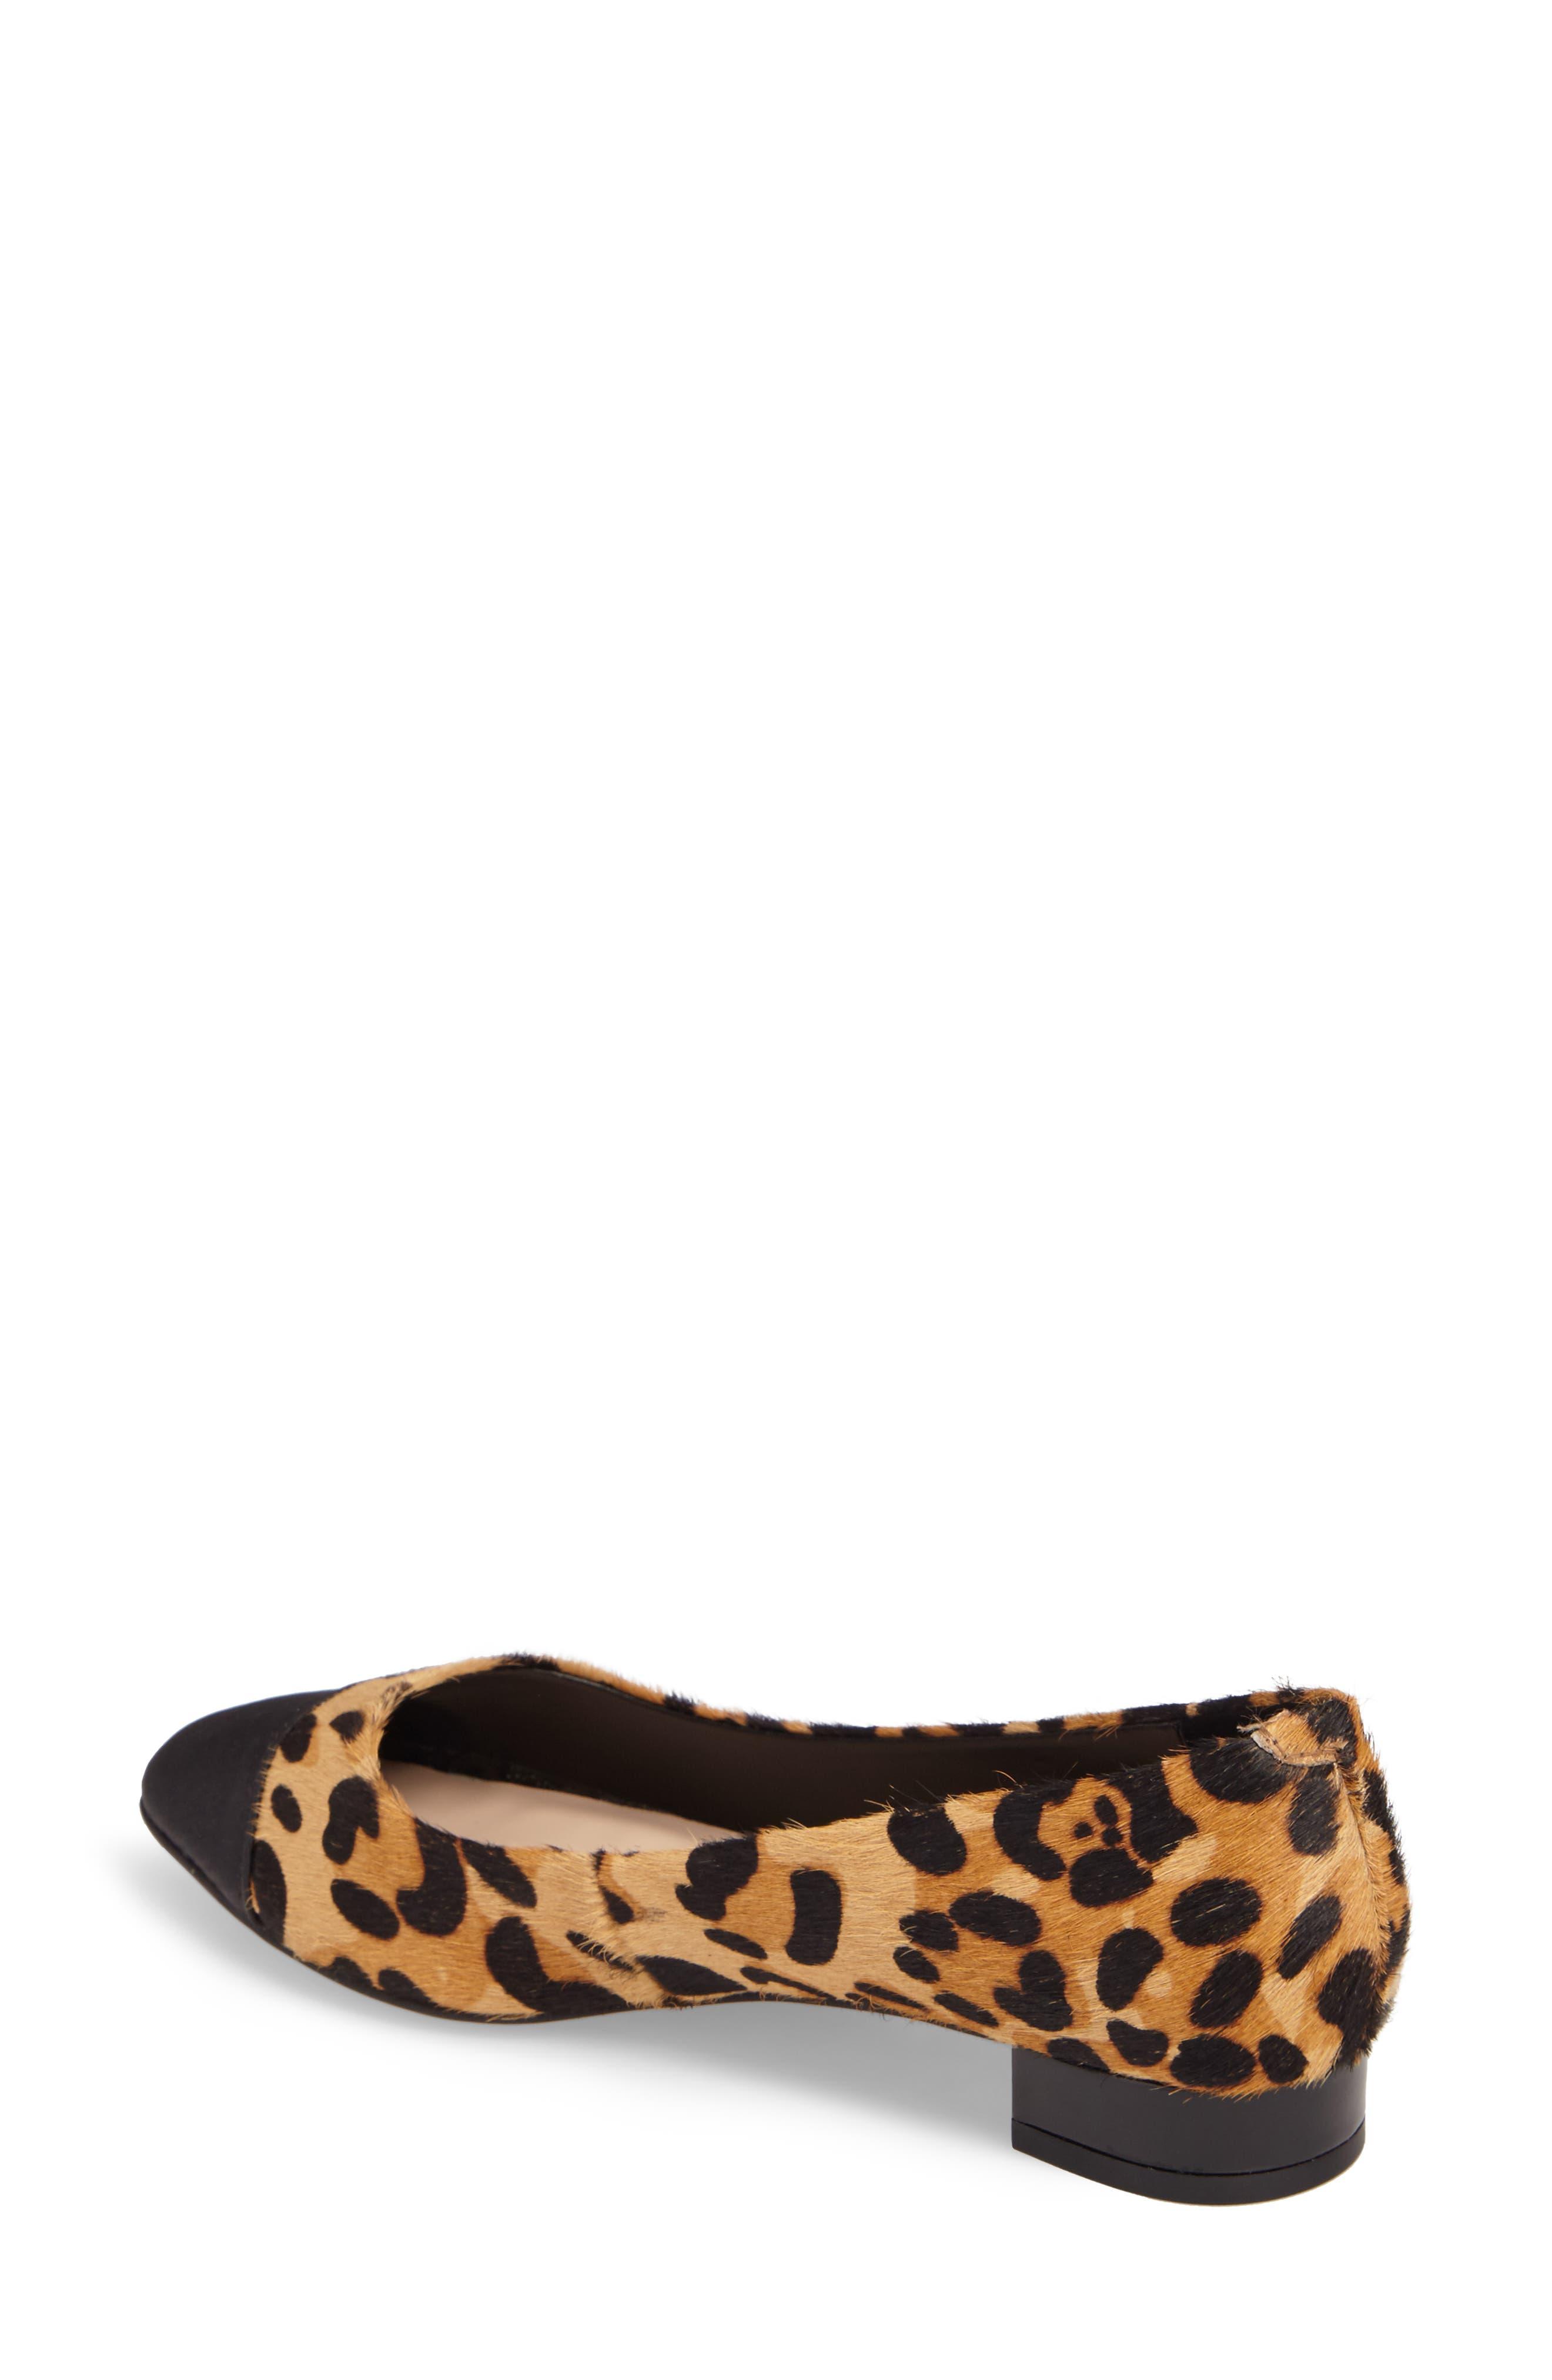 Brea Flat,                             Alternate thumbnail 2, color,                             Leopard Calf Hair